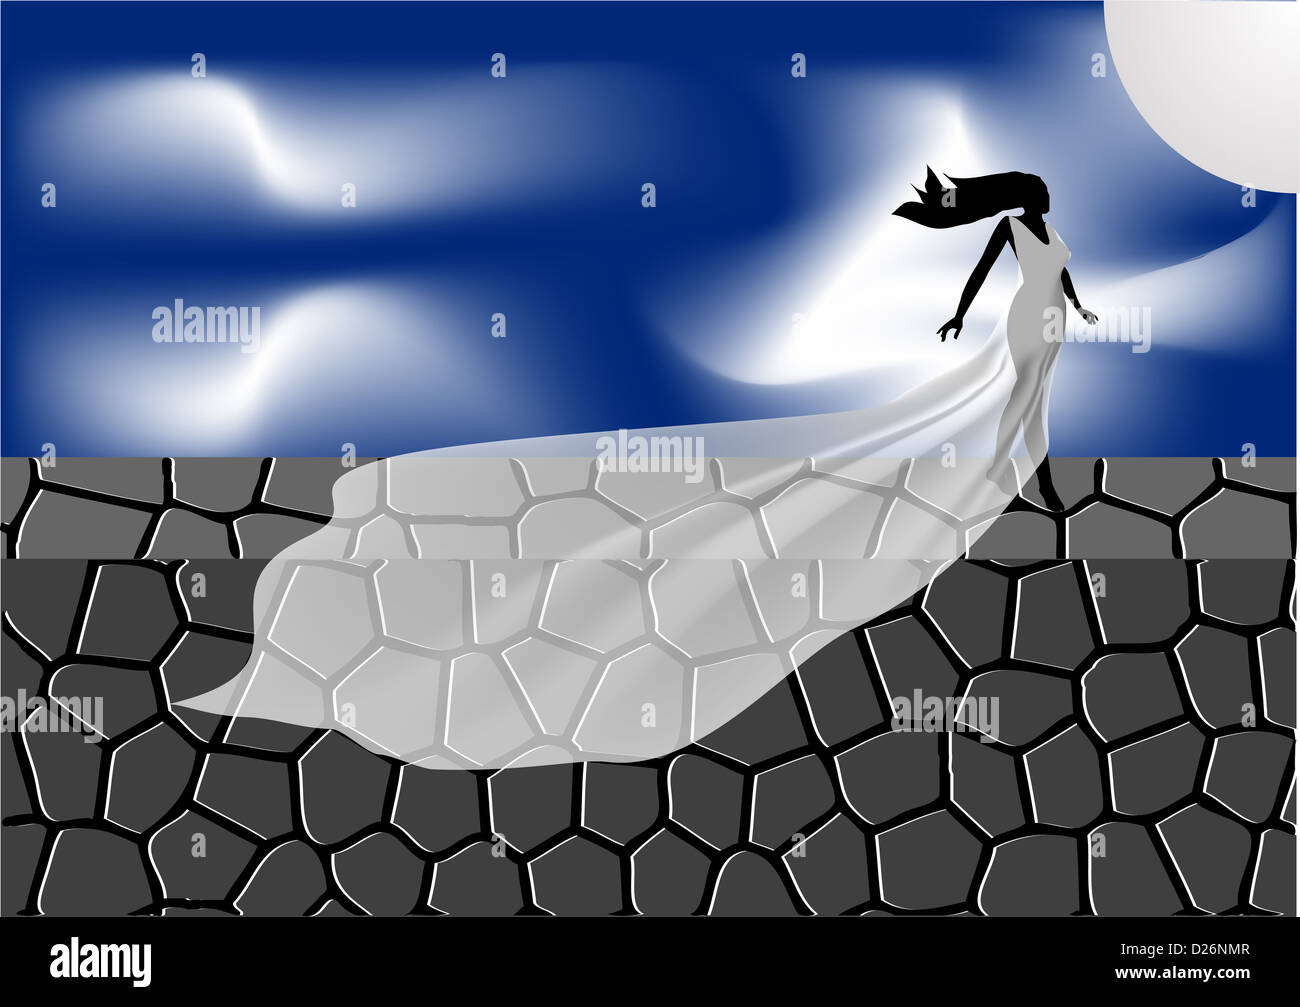 how to stop a sleepwalker from sleepwalking